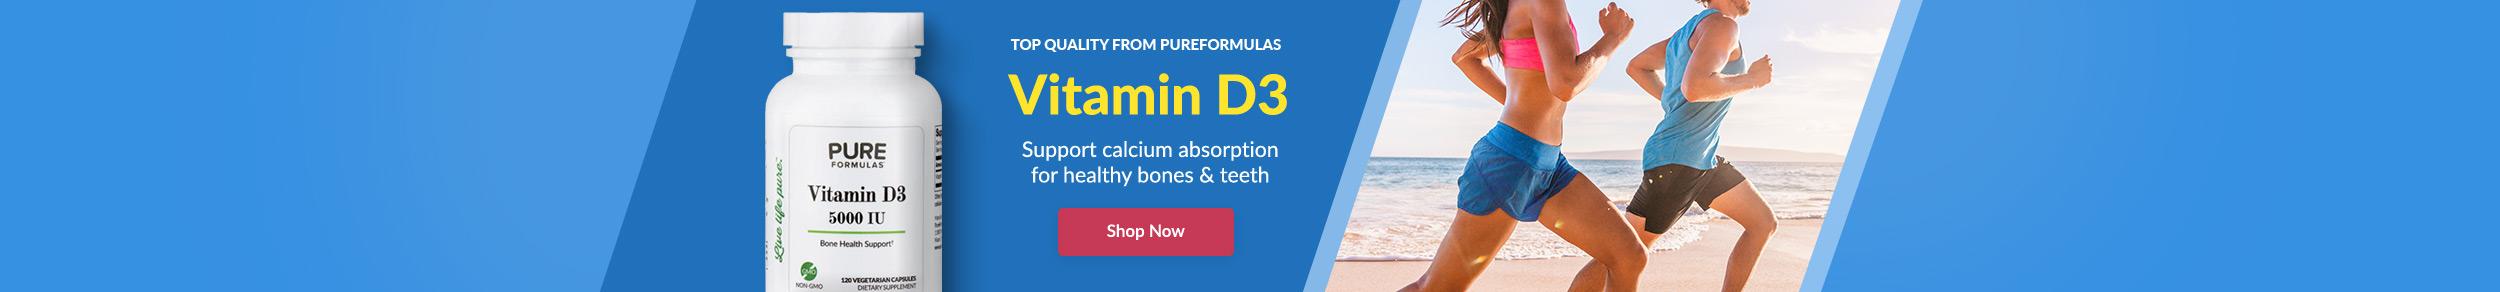 https://i3.pureformulas.net/images/static/Pureformulas-Bone-Health-Vitamin-D3_slide2_061218.jpg